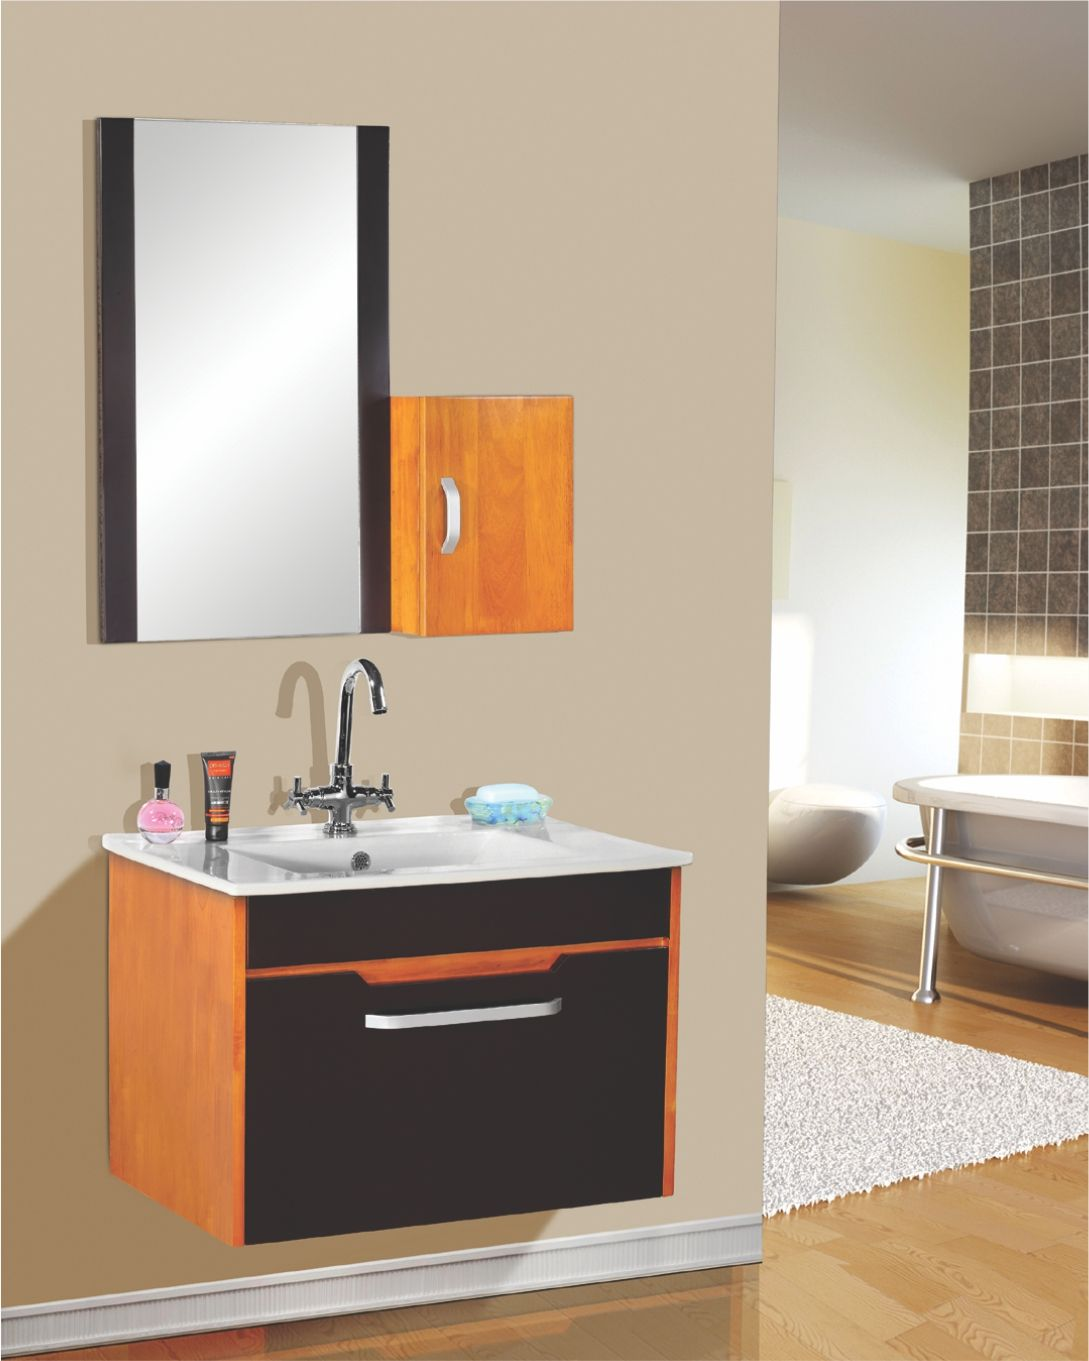 Sns 991 Solid Wood Bathroom Cabinet 700x460mm Bathroom Cabinets Wooden Wood Bathroom Cabinets Bathroom Cabinets Wood Bathroom